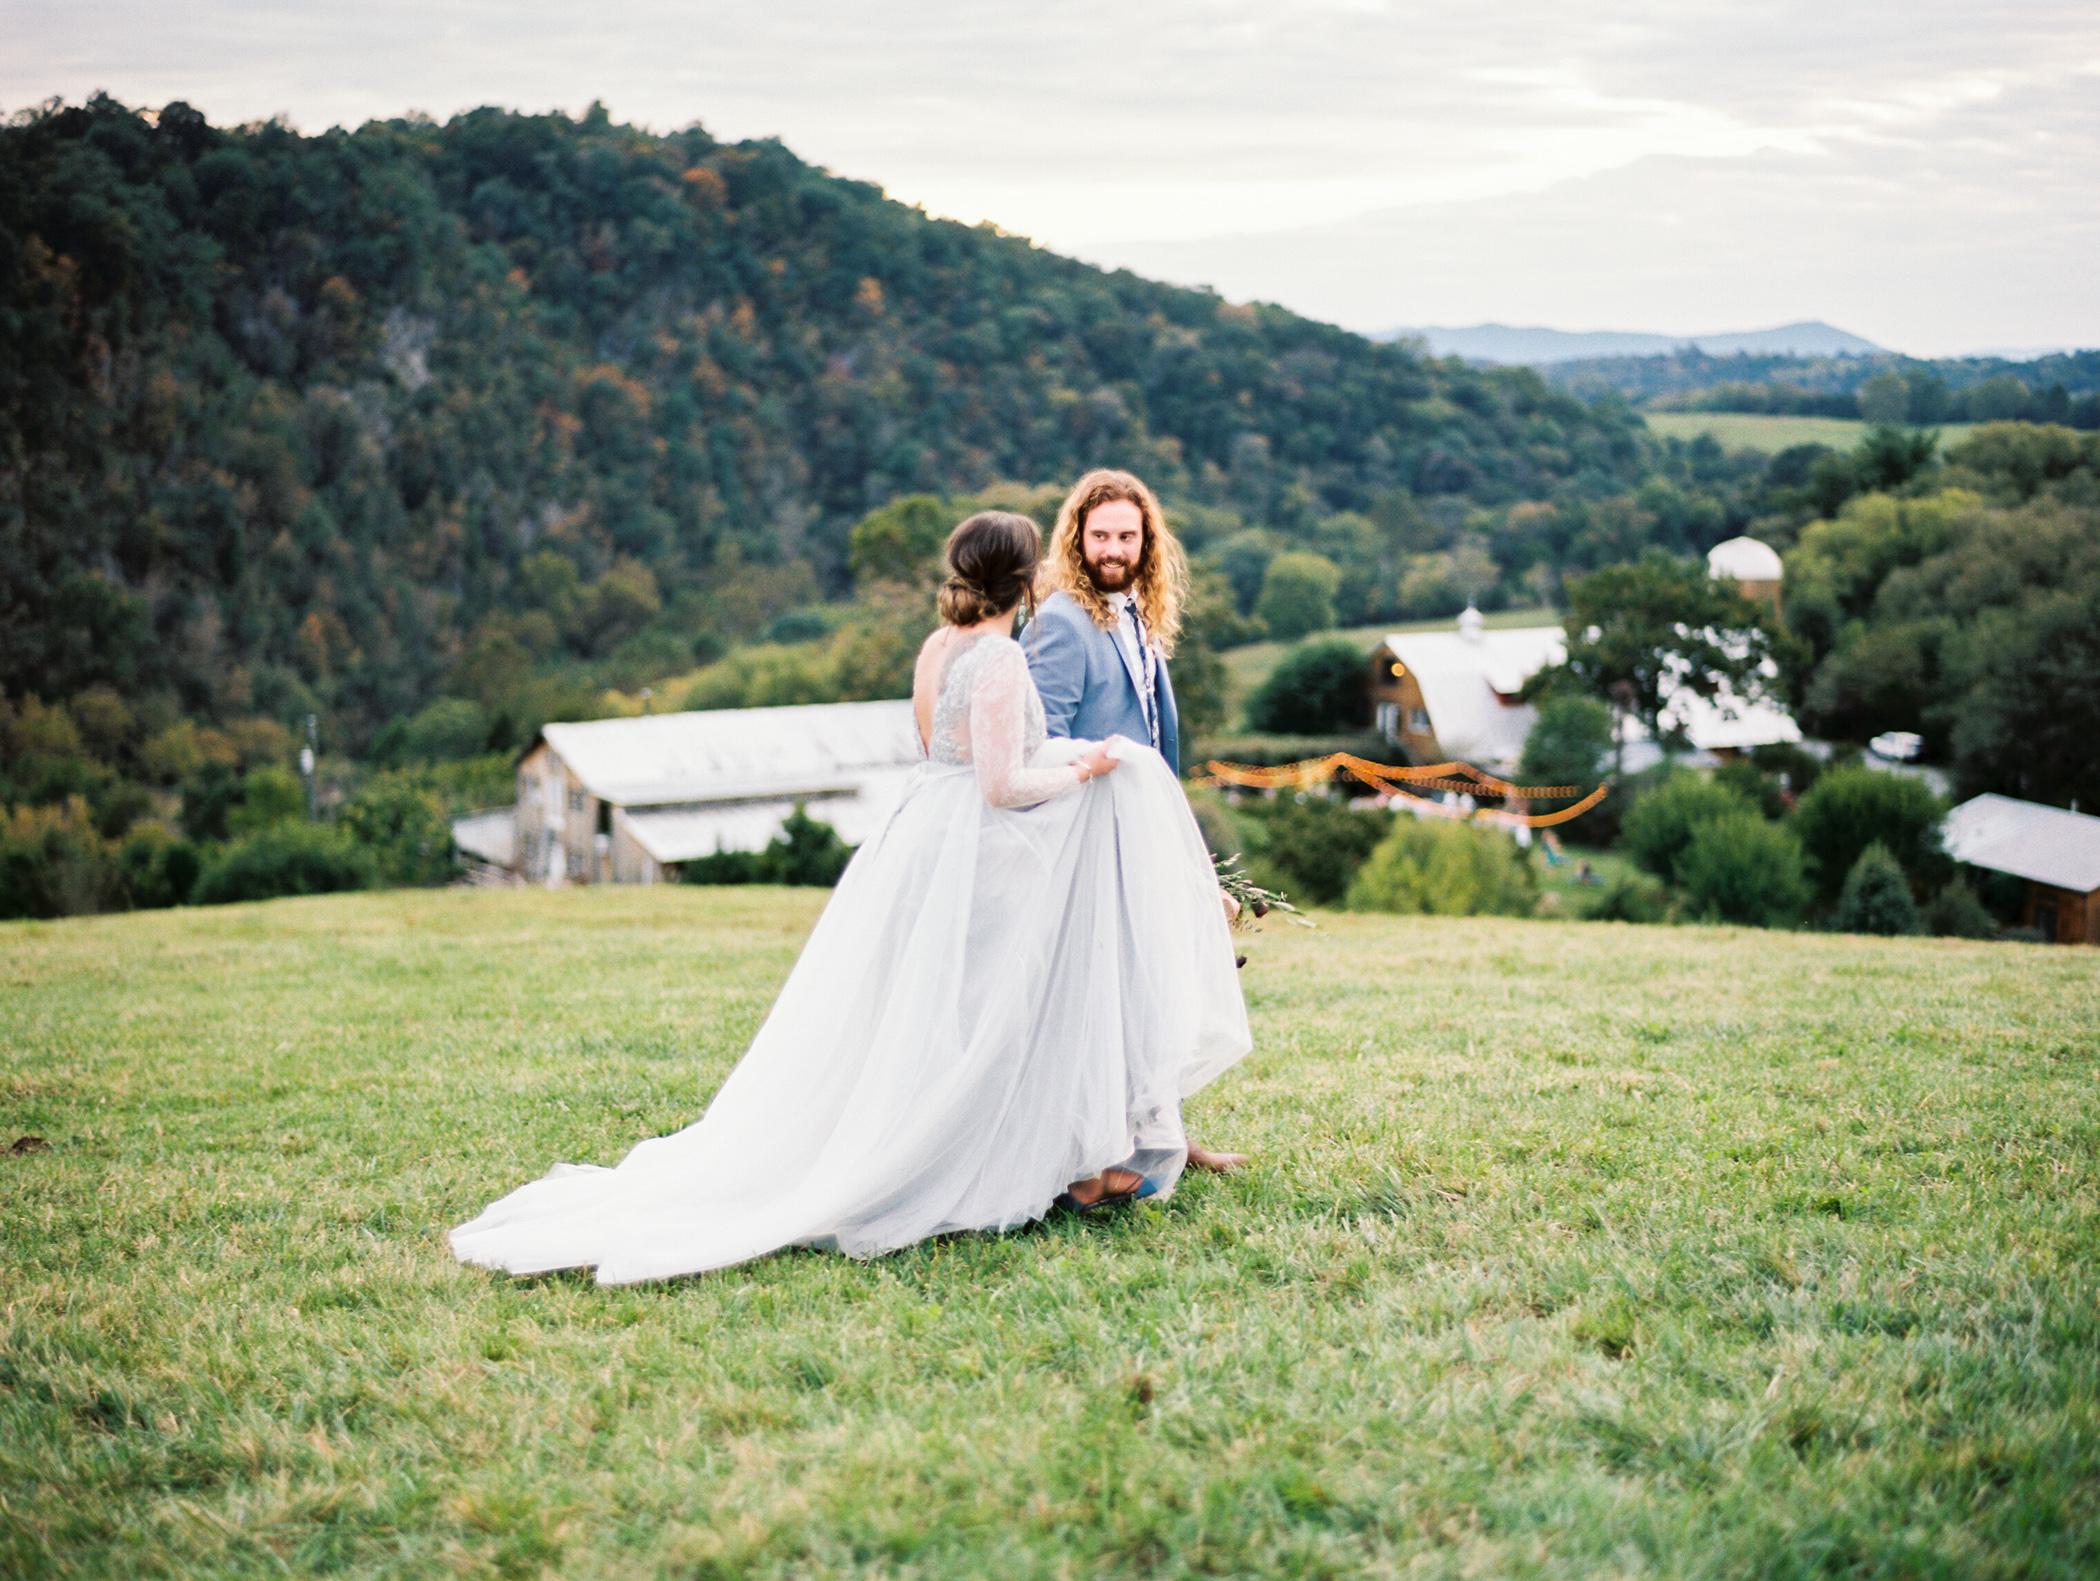 Charlotte-Film-Wedding_Photographer-heartstone-lodge-virginia-37.jpg